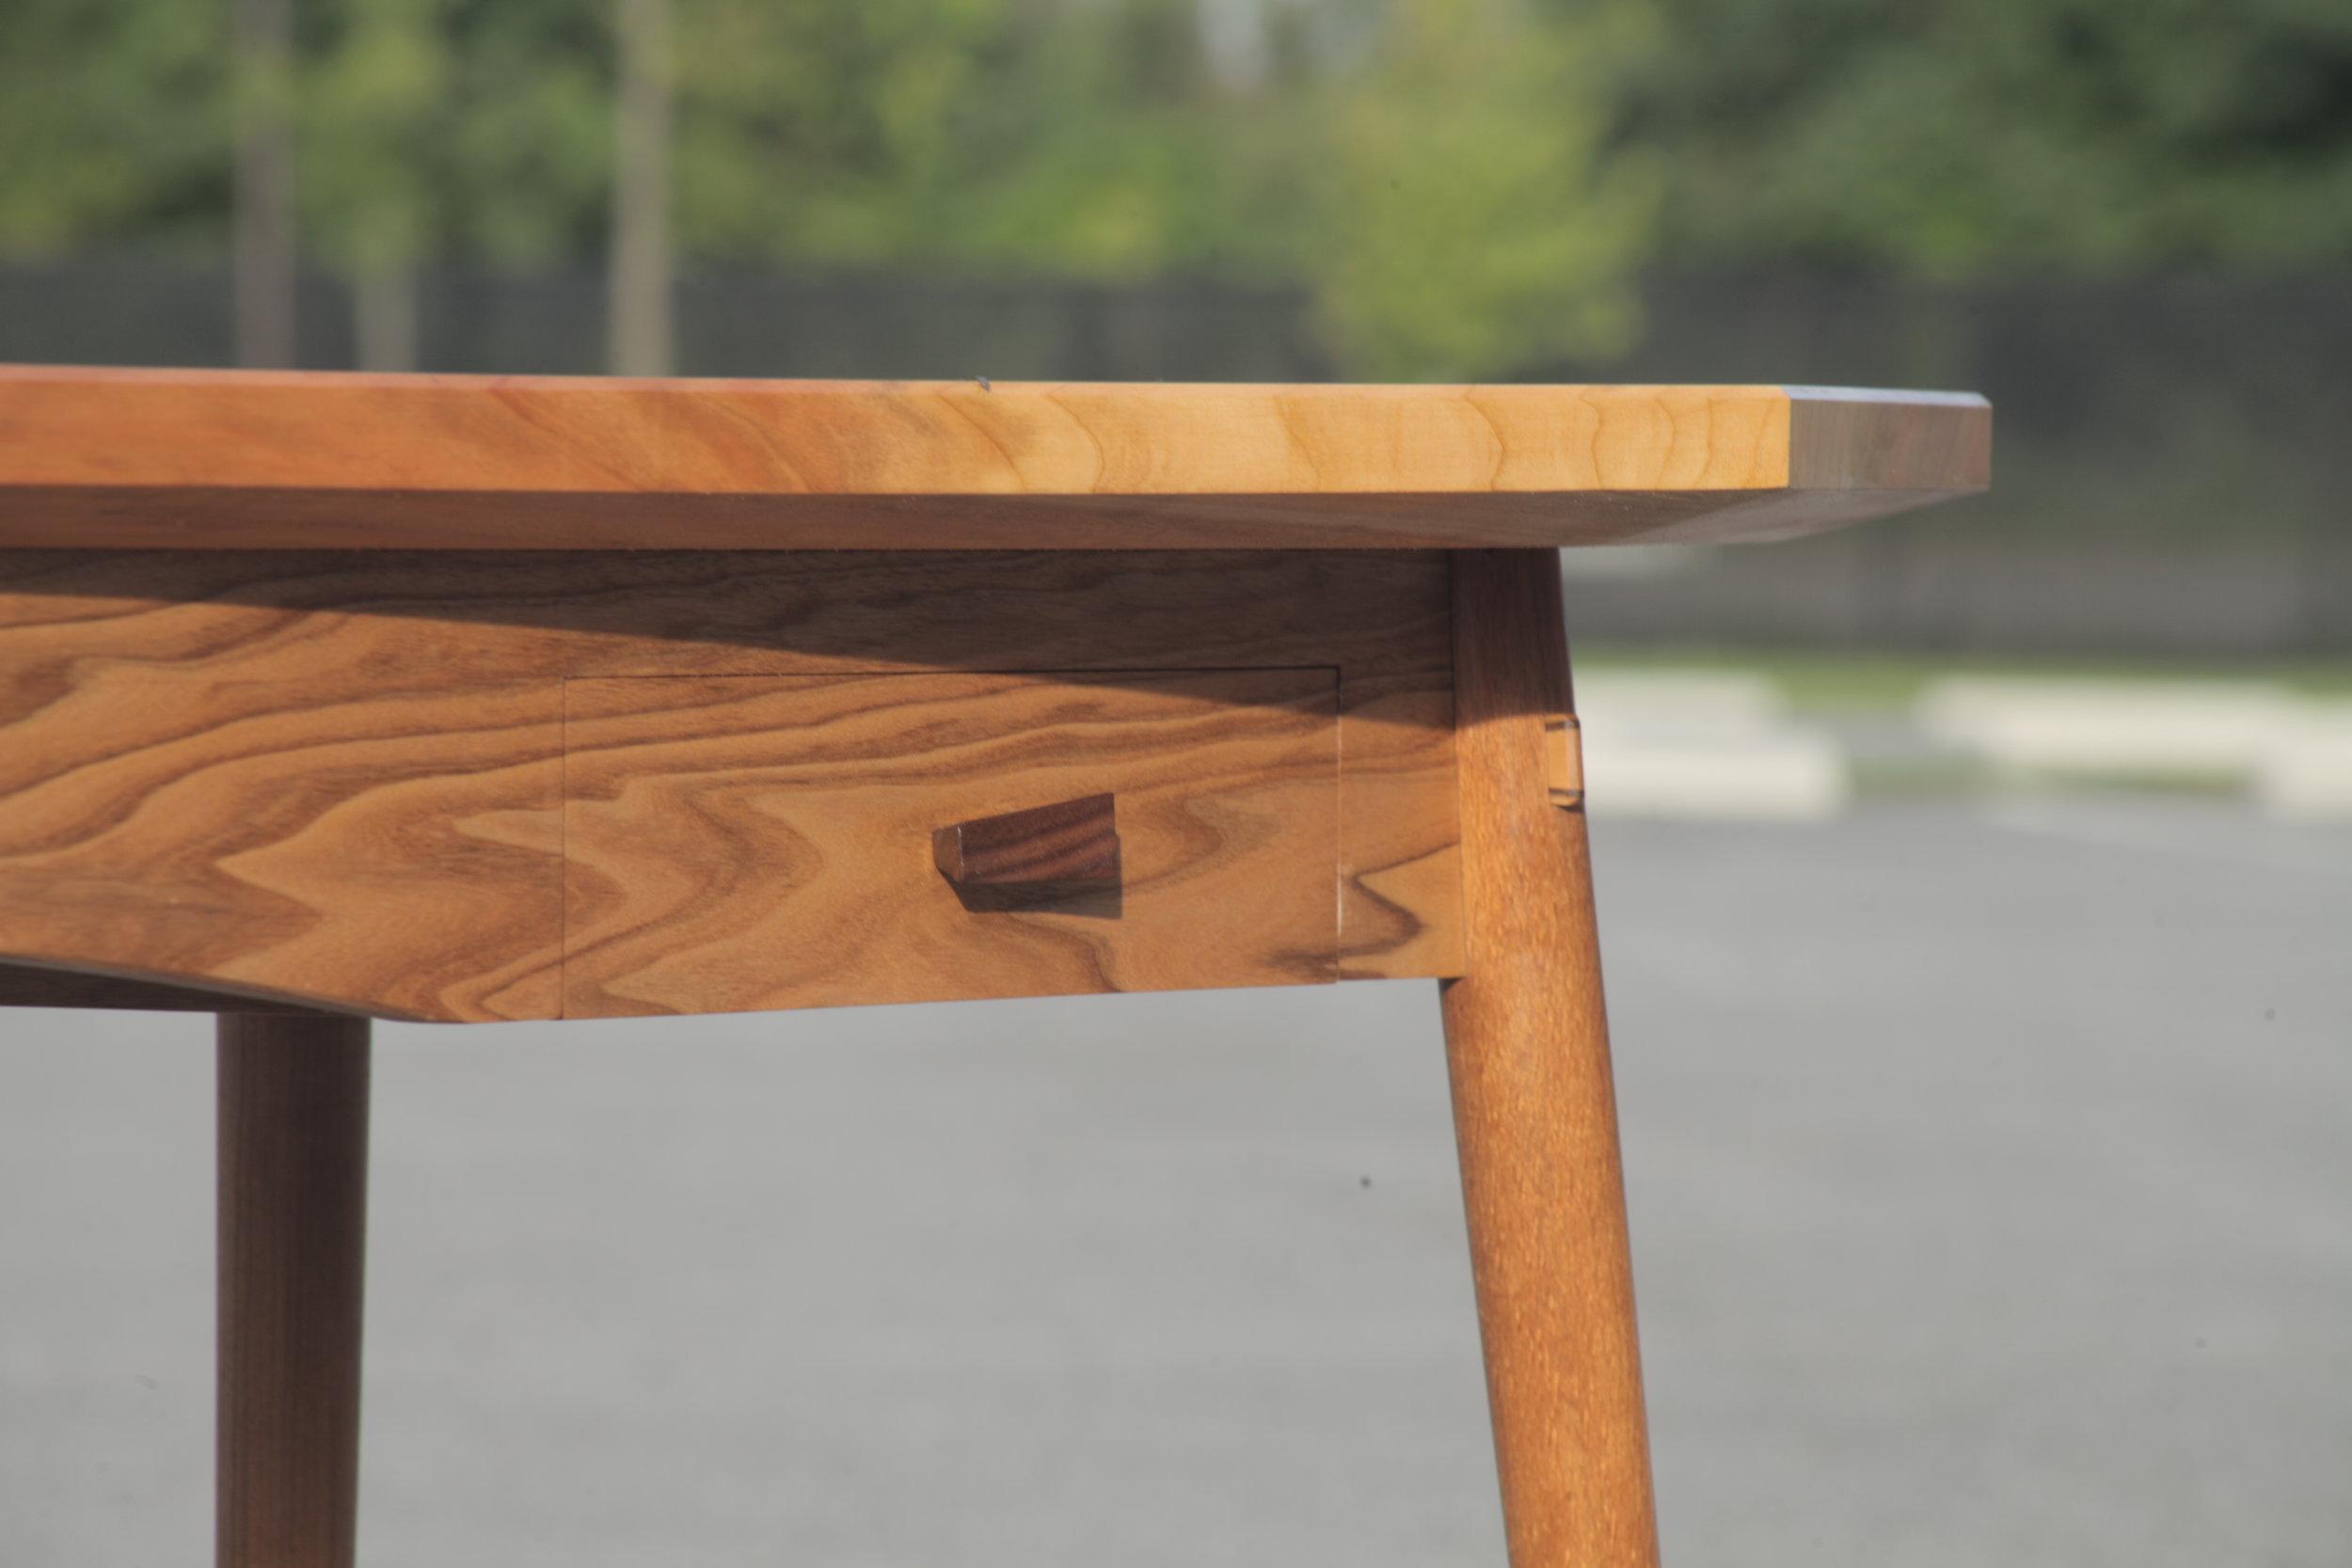 grain-match-cherry-desk-drawers.jpg